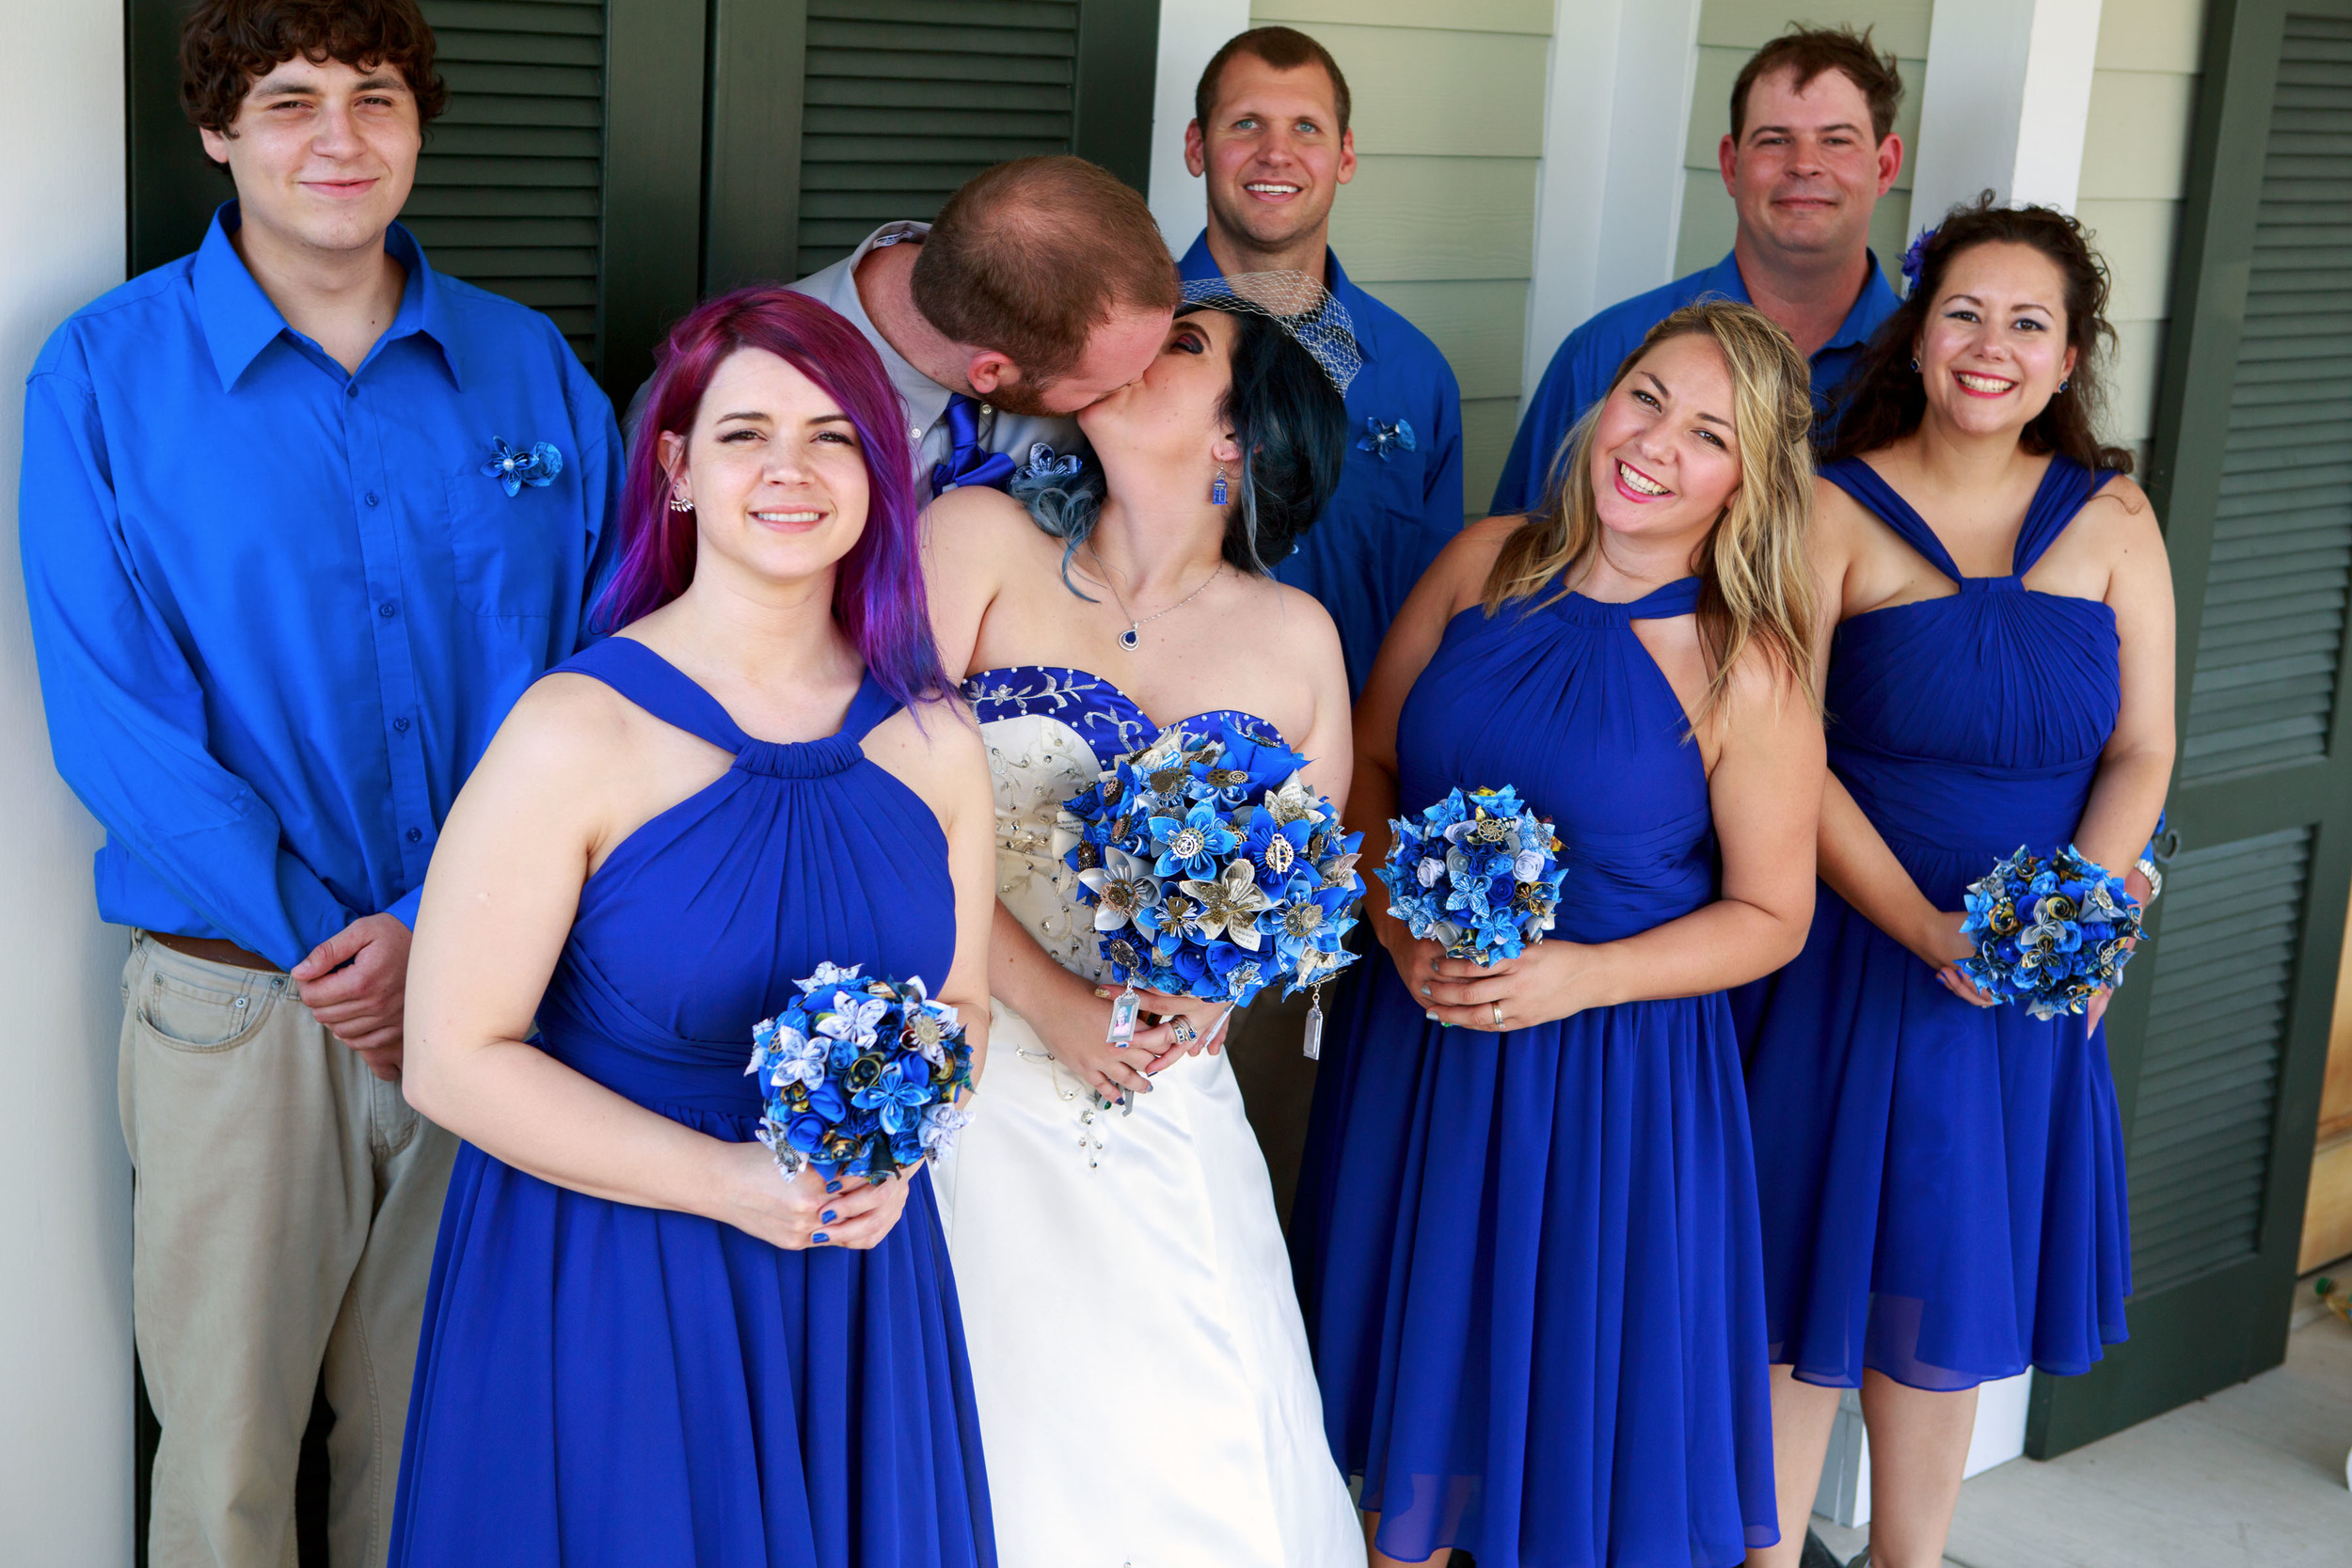 NC_Wedding_Photographer_Tiffany_Abruzzo_Family_Portraits_48.jpg